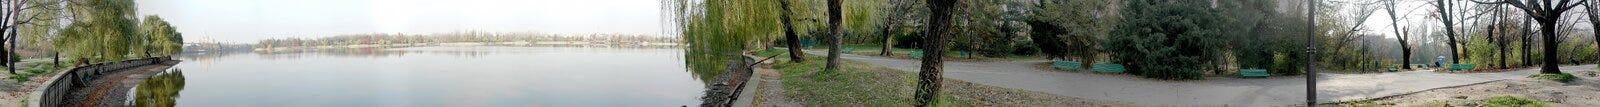 Lago Herastrau 360 graus de panorama Imagens de Stock Royalty Free